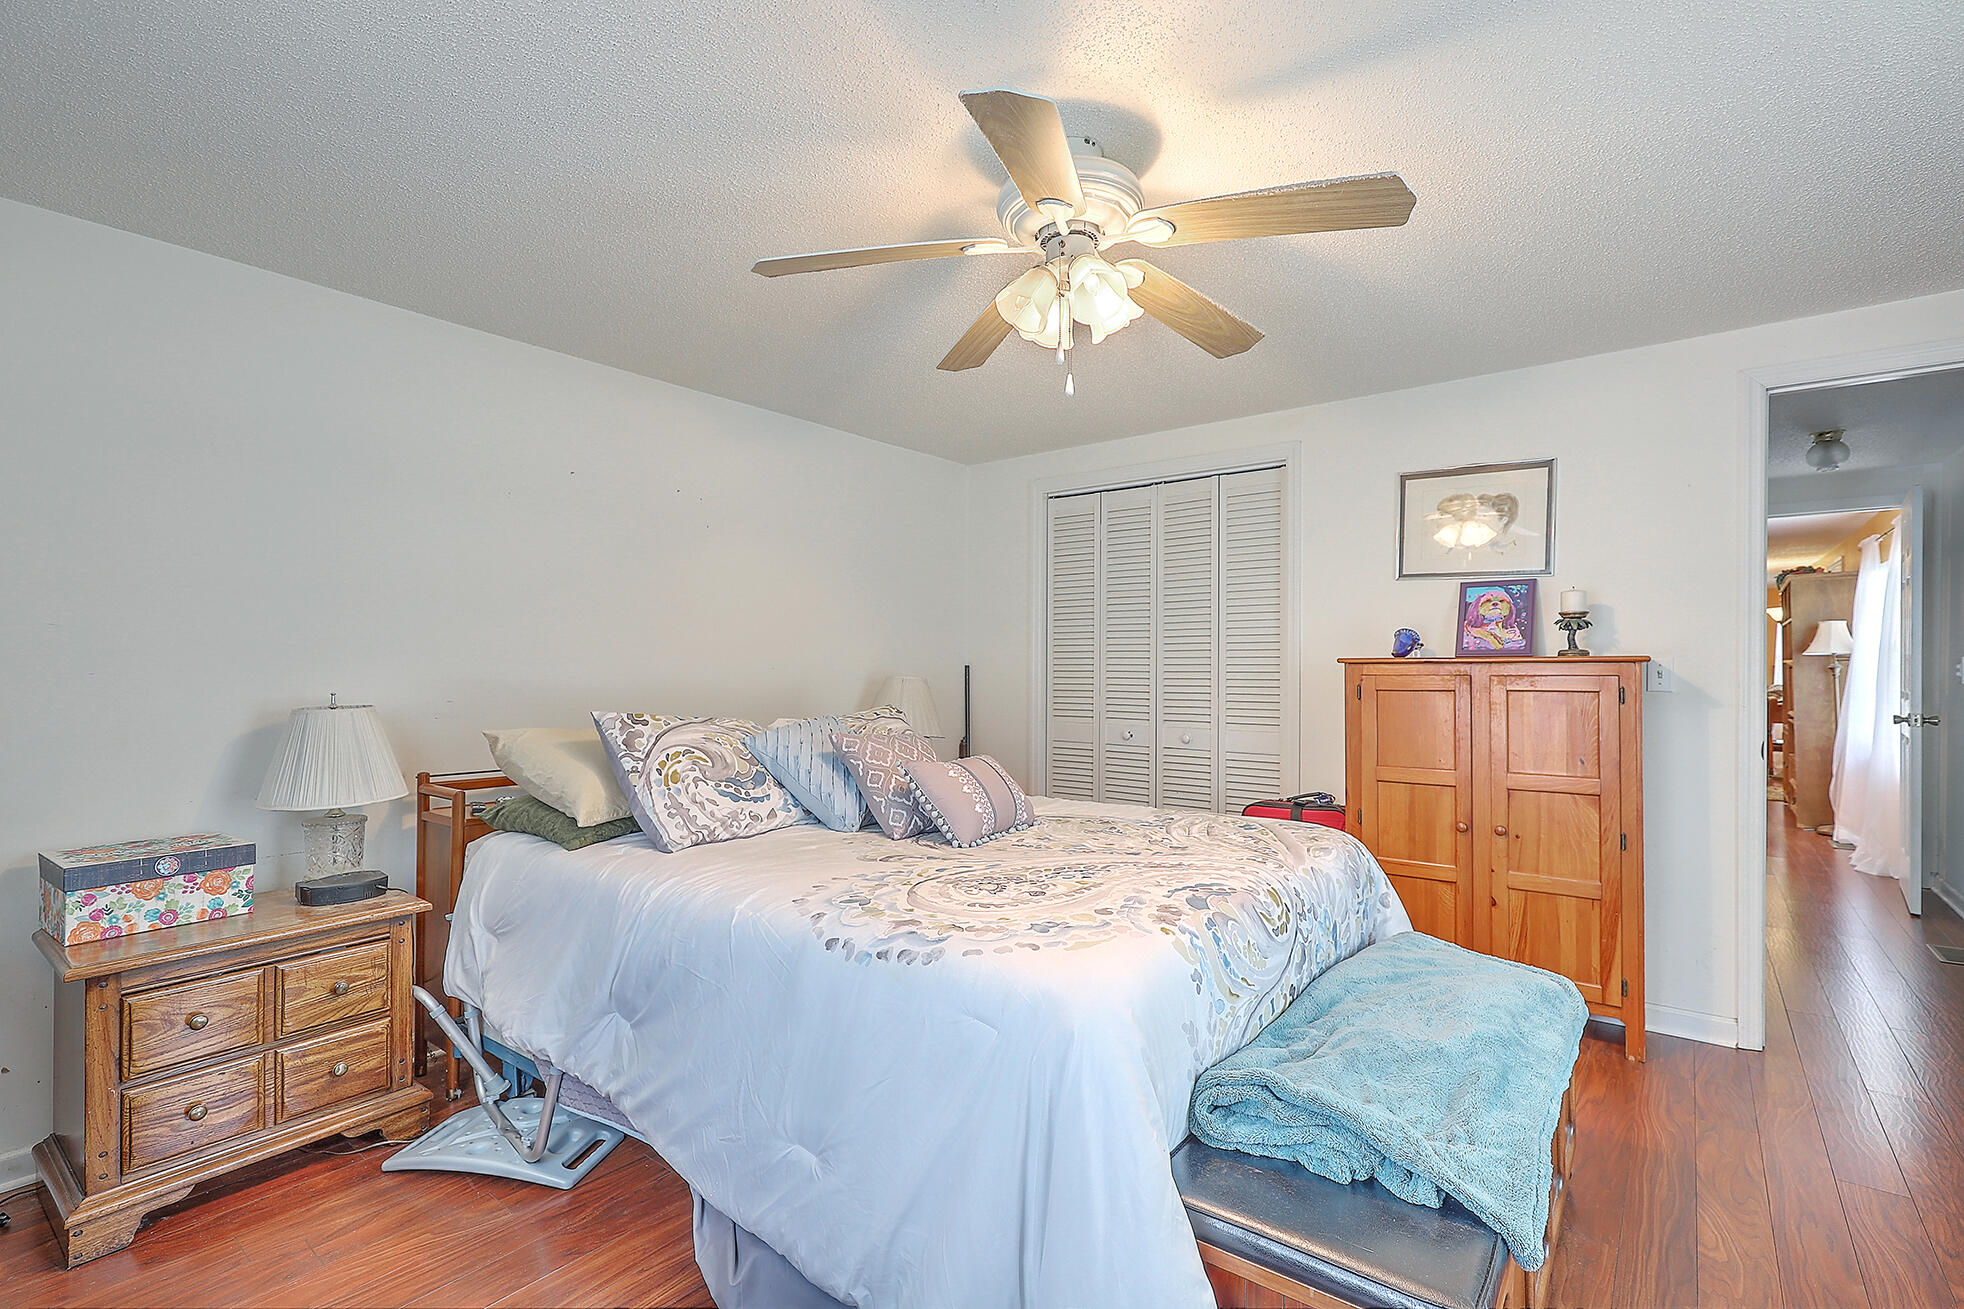 Cross Area (West) Homes For Sale - 128 Cherry Grove, Cross, SC - 13